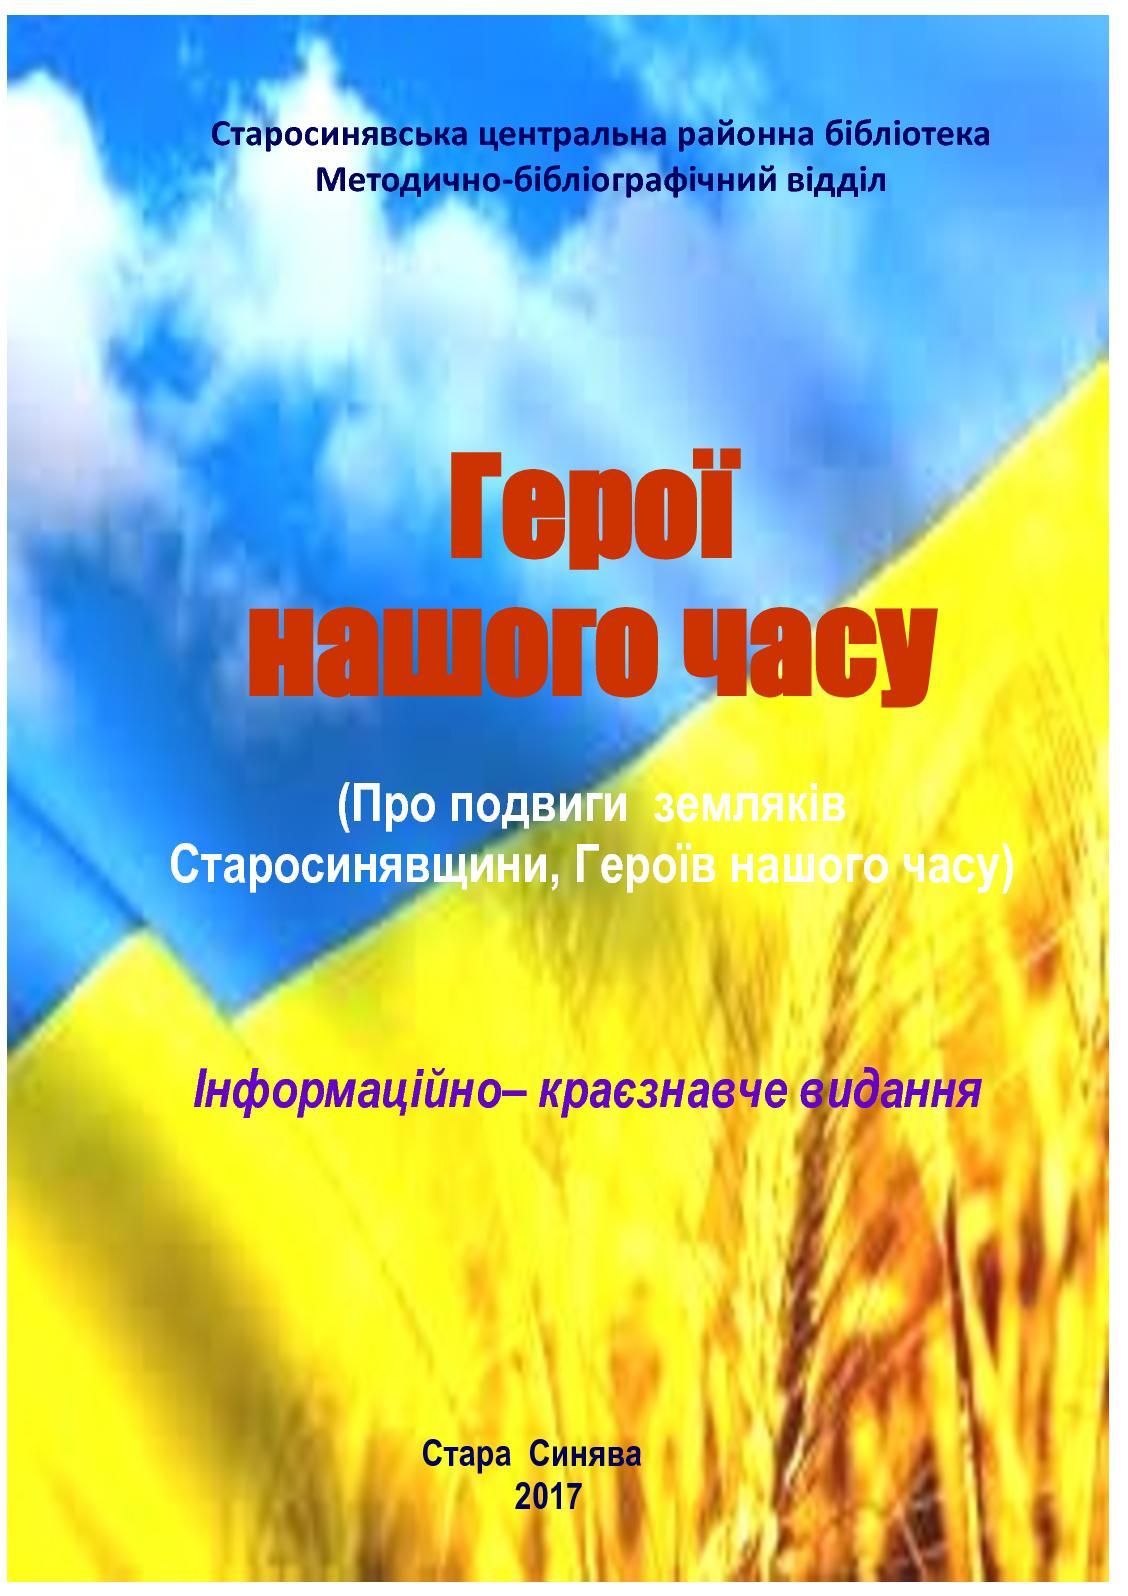 Публикация Вони боронили Україну Вип.2